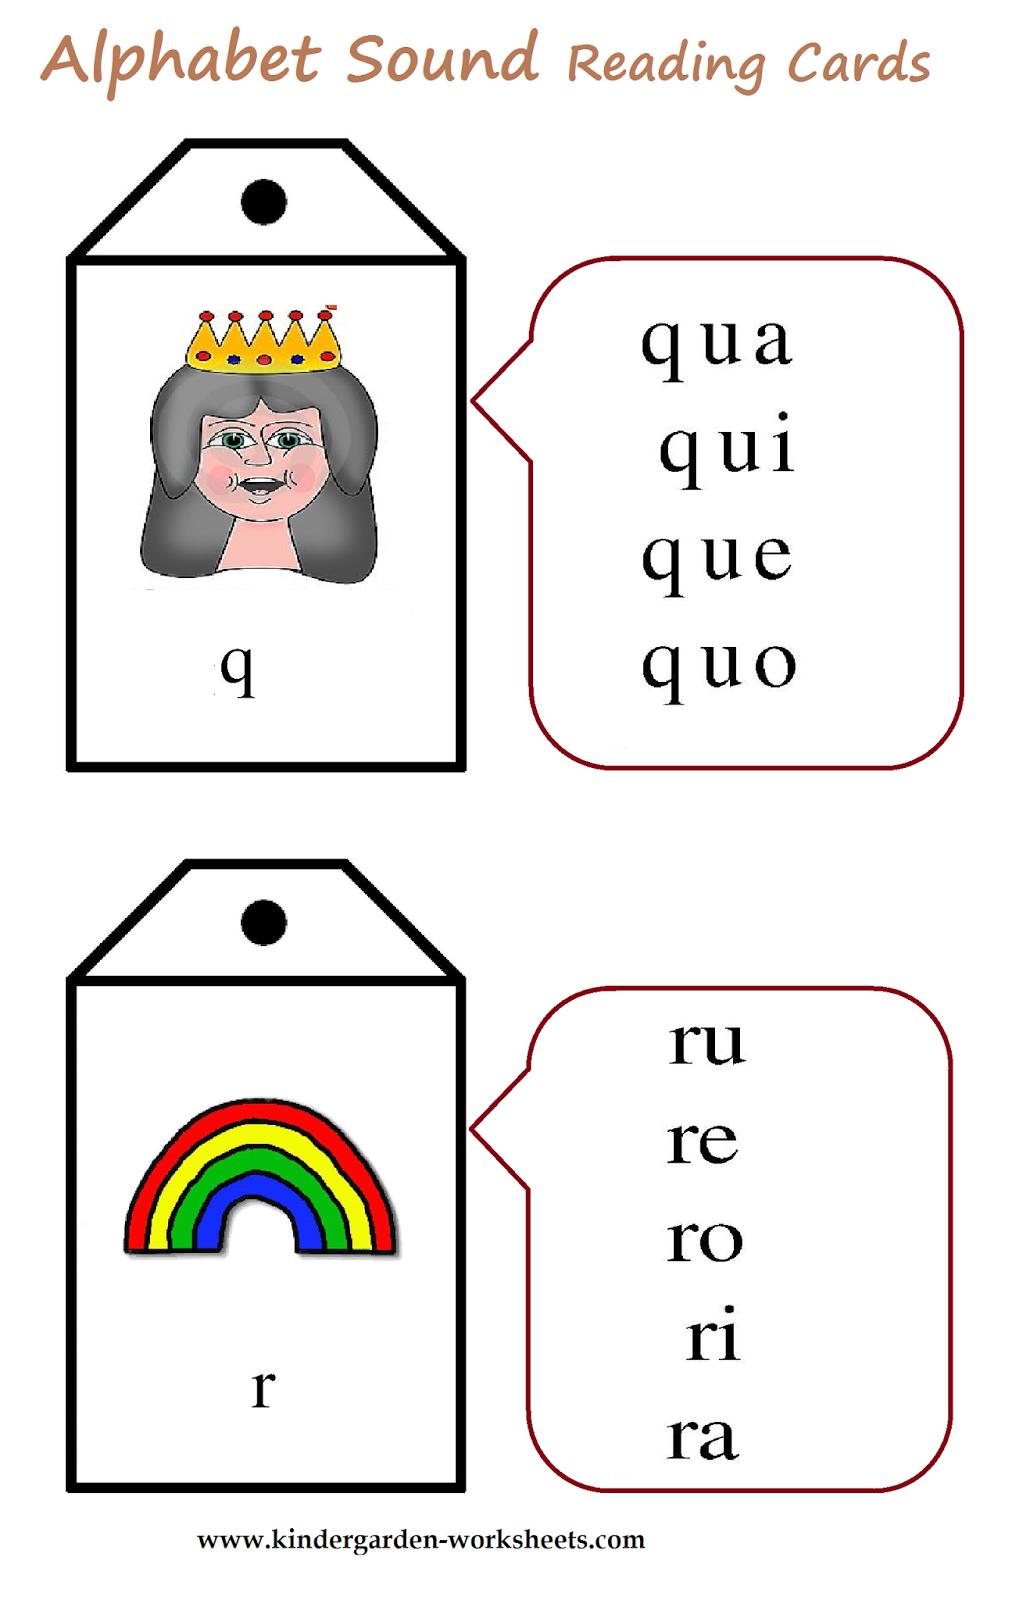 Kindergarten Worksheets Alphabet Sound Read Cards